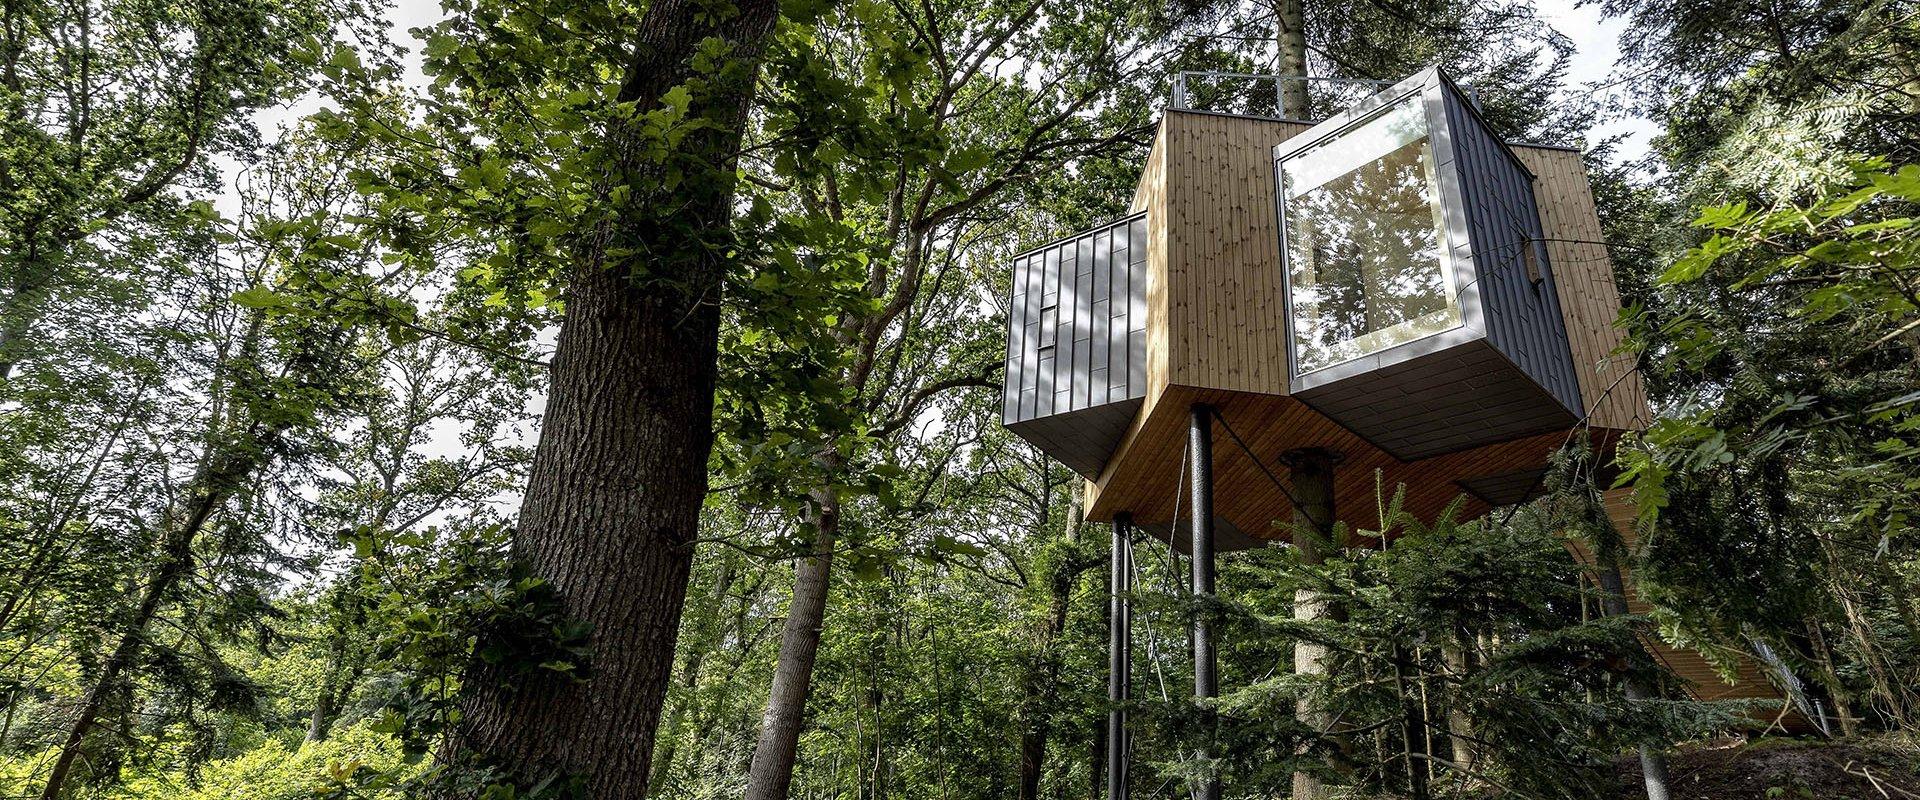 Skruefundamenter skåner trærødder under trætophotel